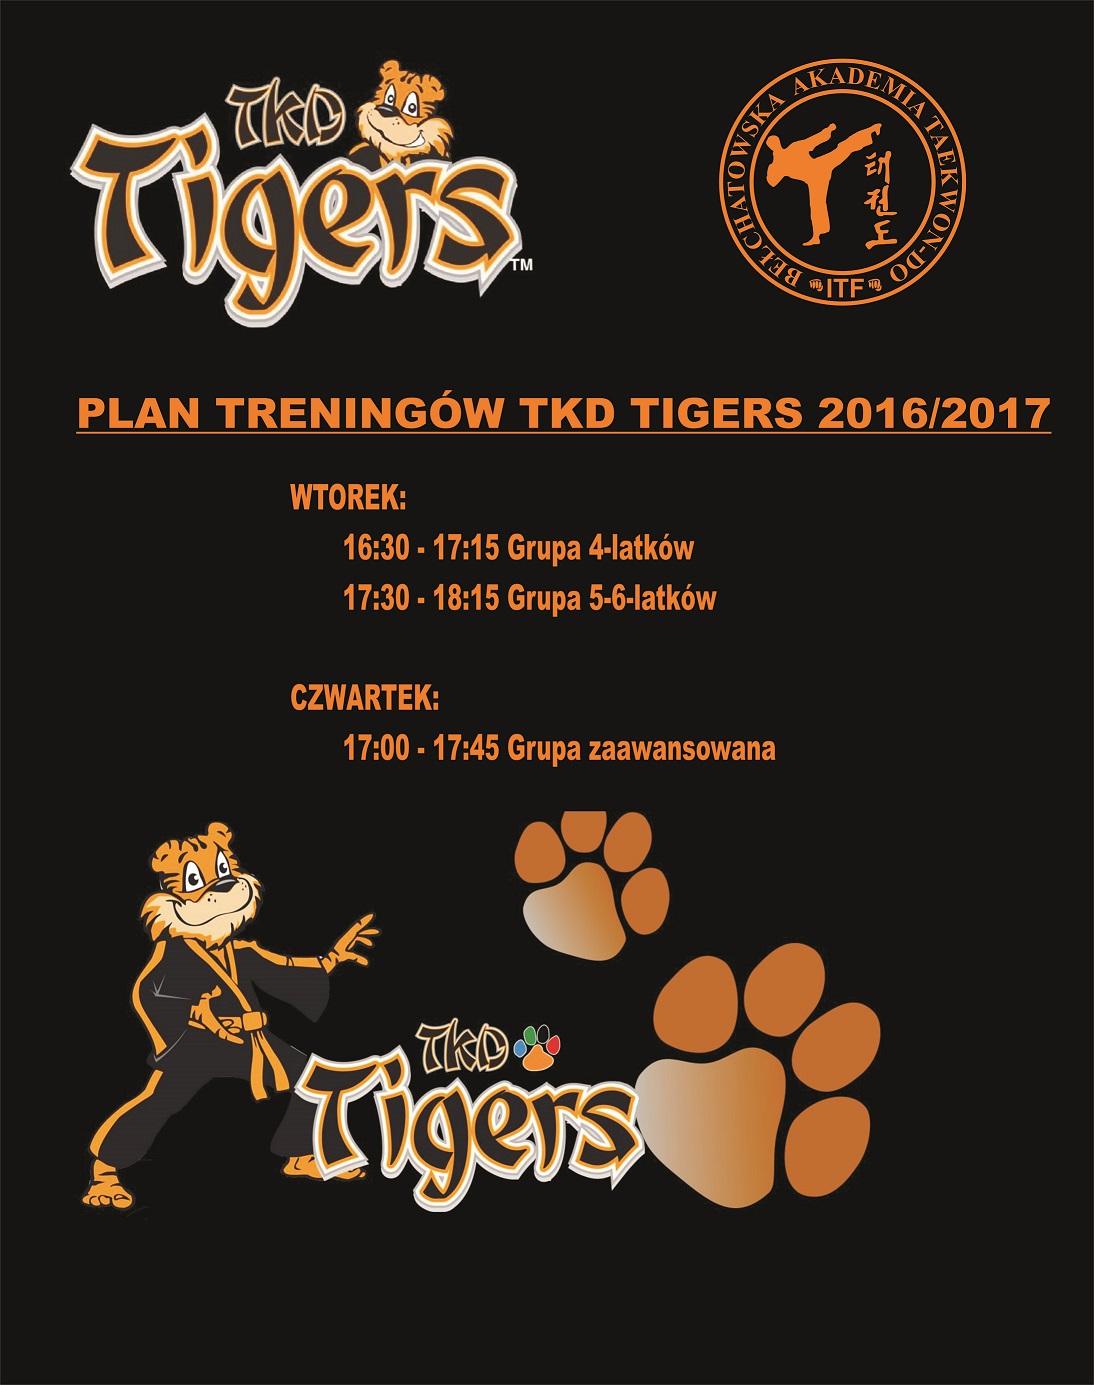 plan-treningow-tkd-tigers-2016-2017-cdr